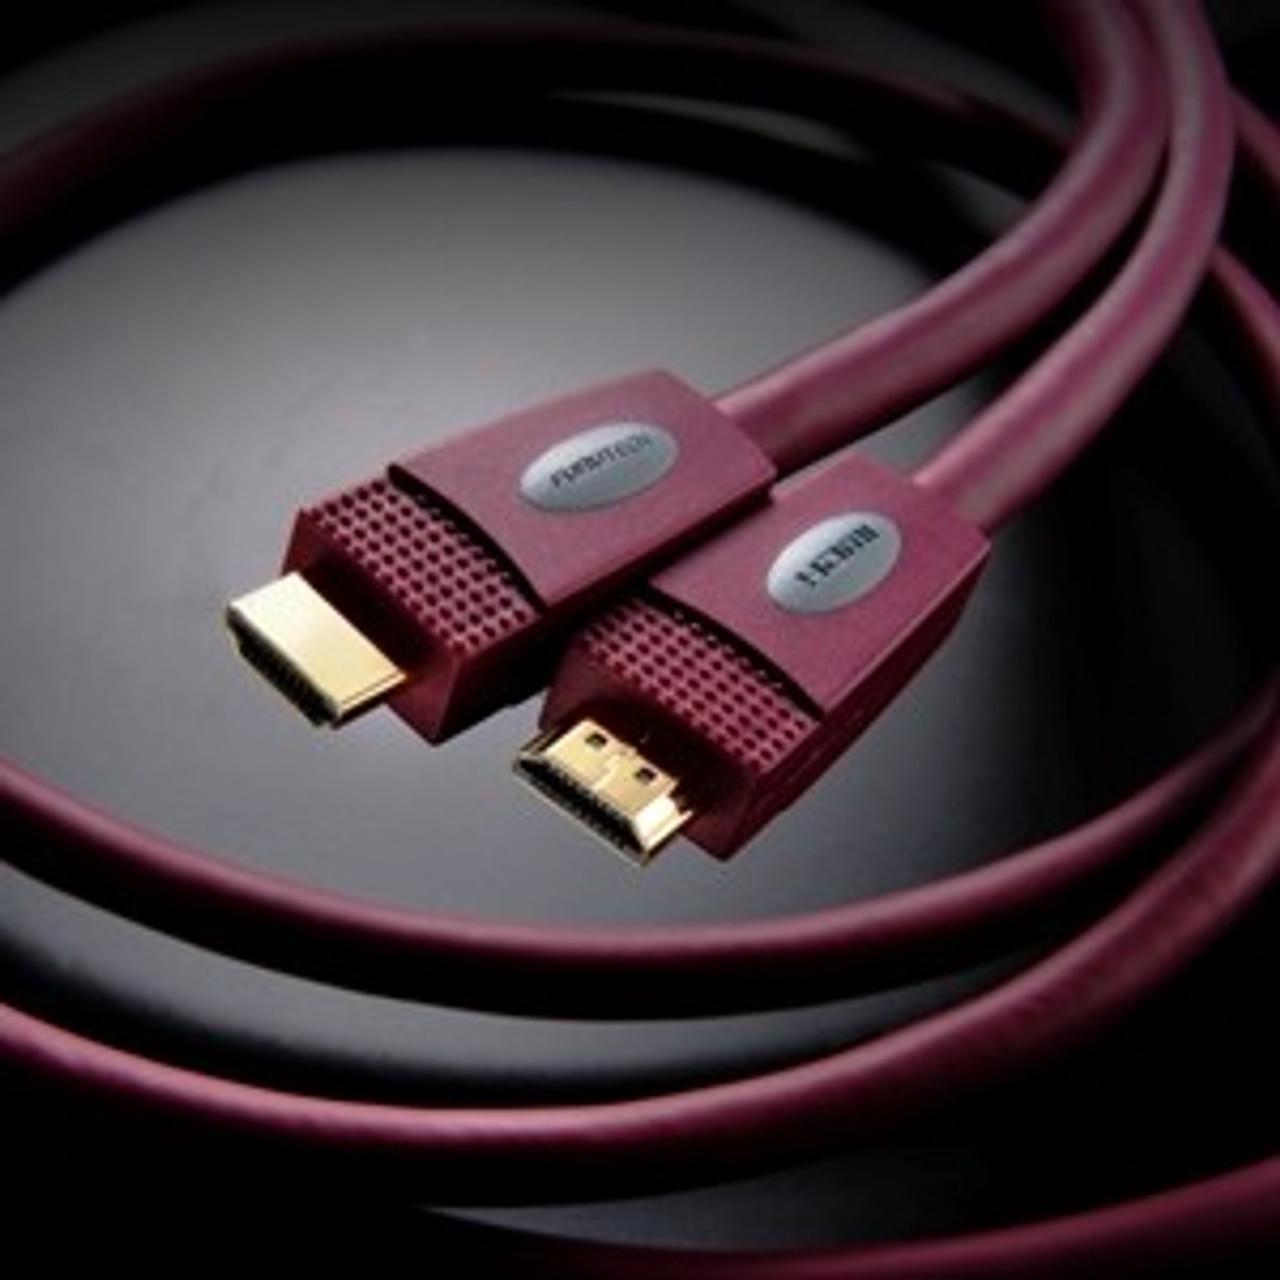 Furutech N1-4 HDMI cable